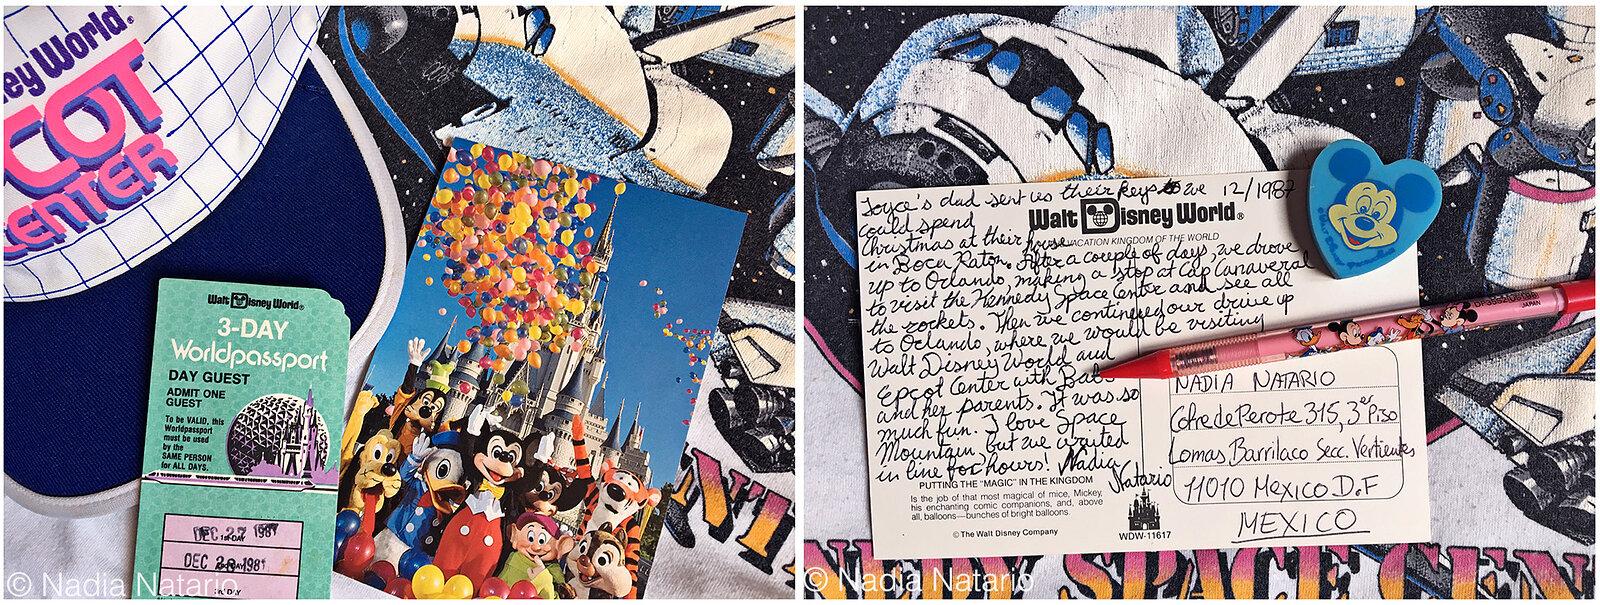 Postcards to Myself - Orlando, U.S.A, 1987